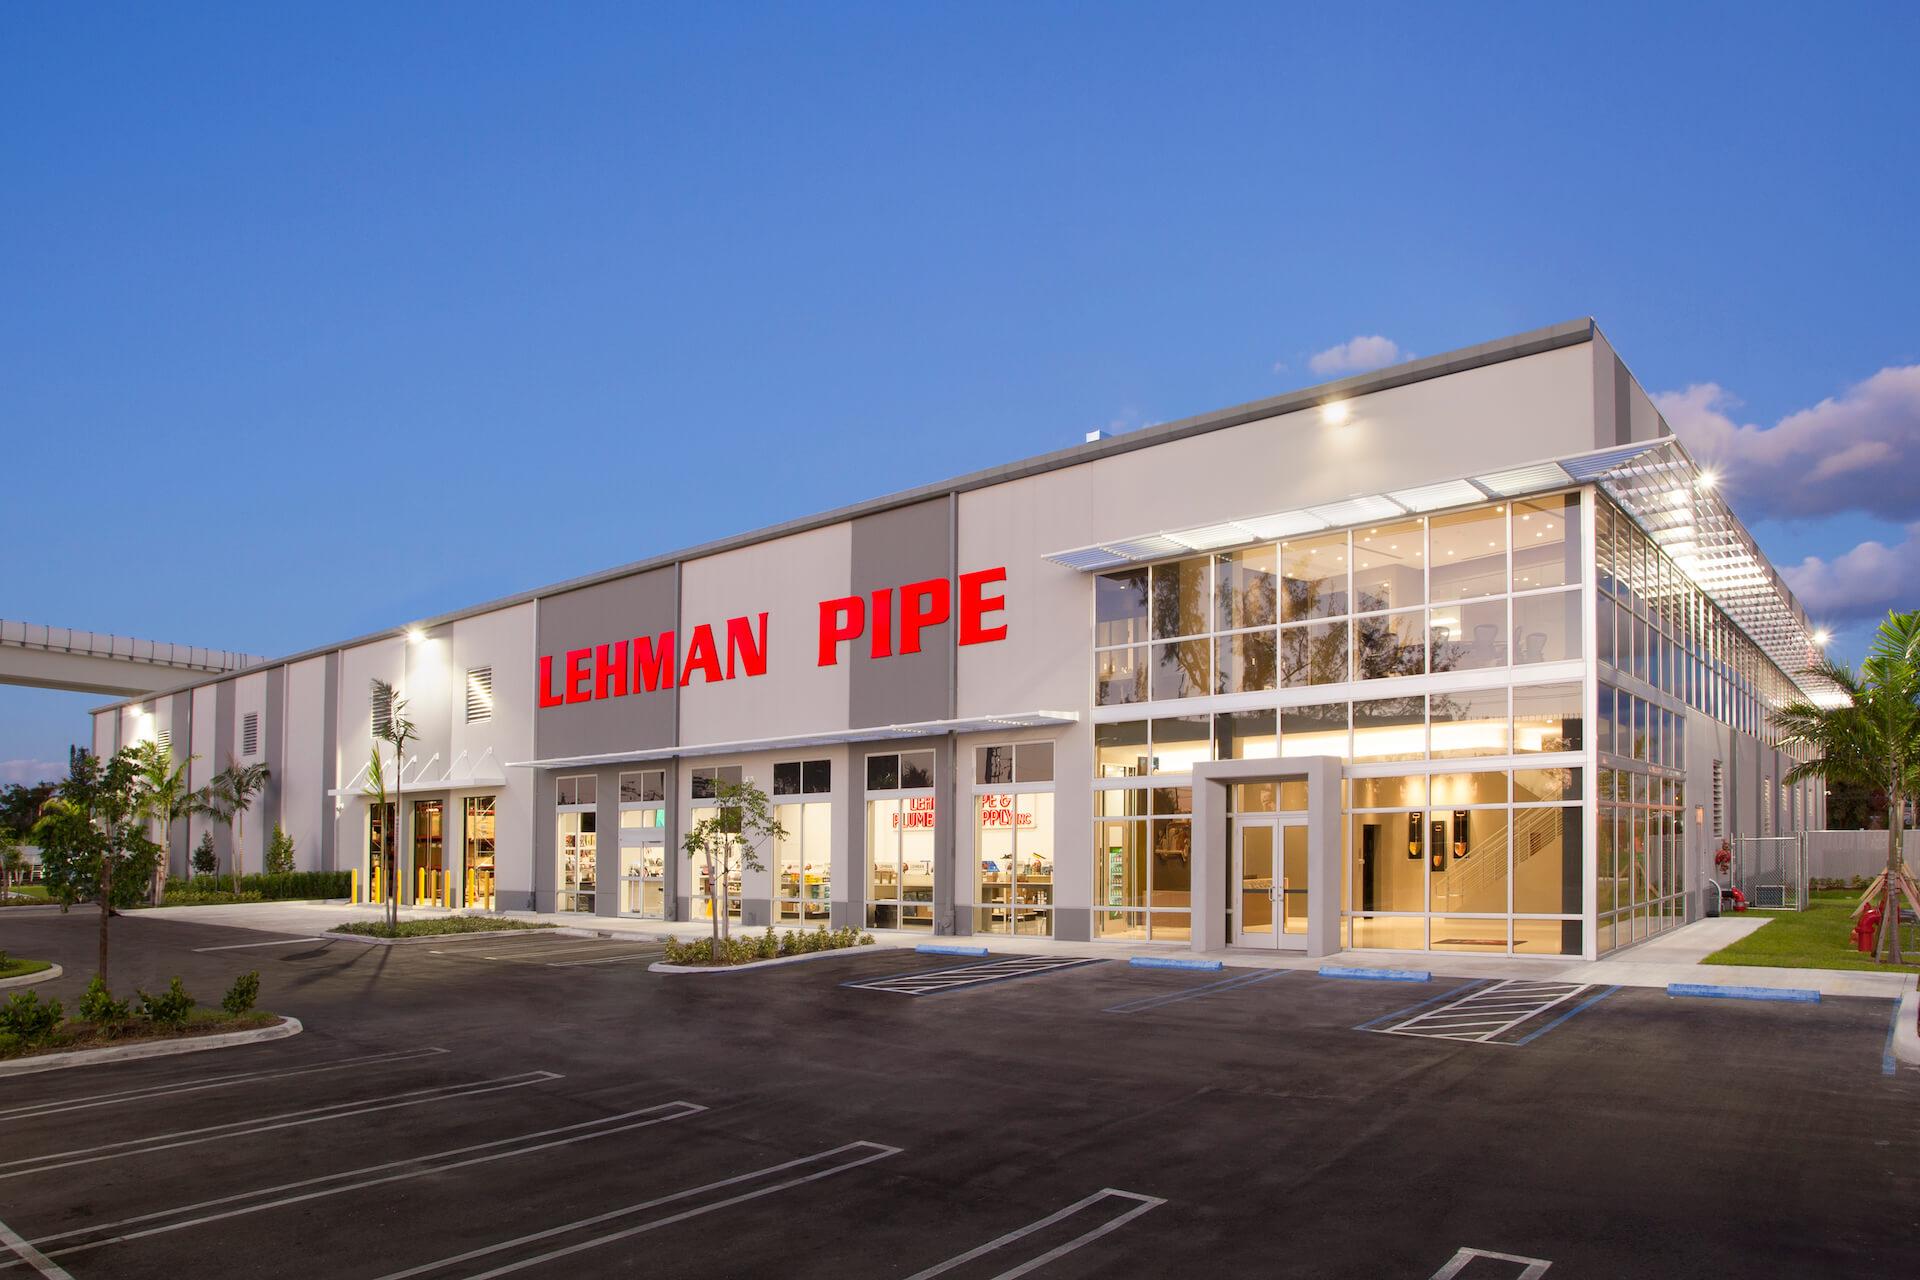 lehman pipe builiding